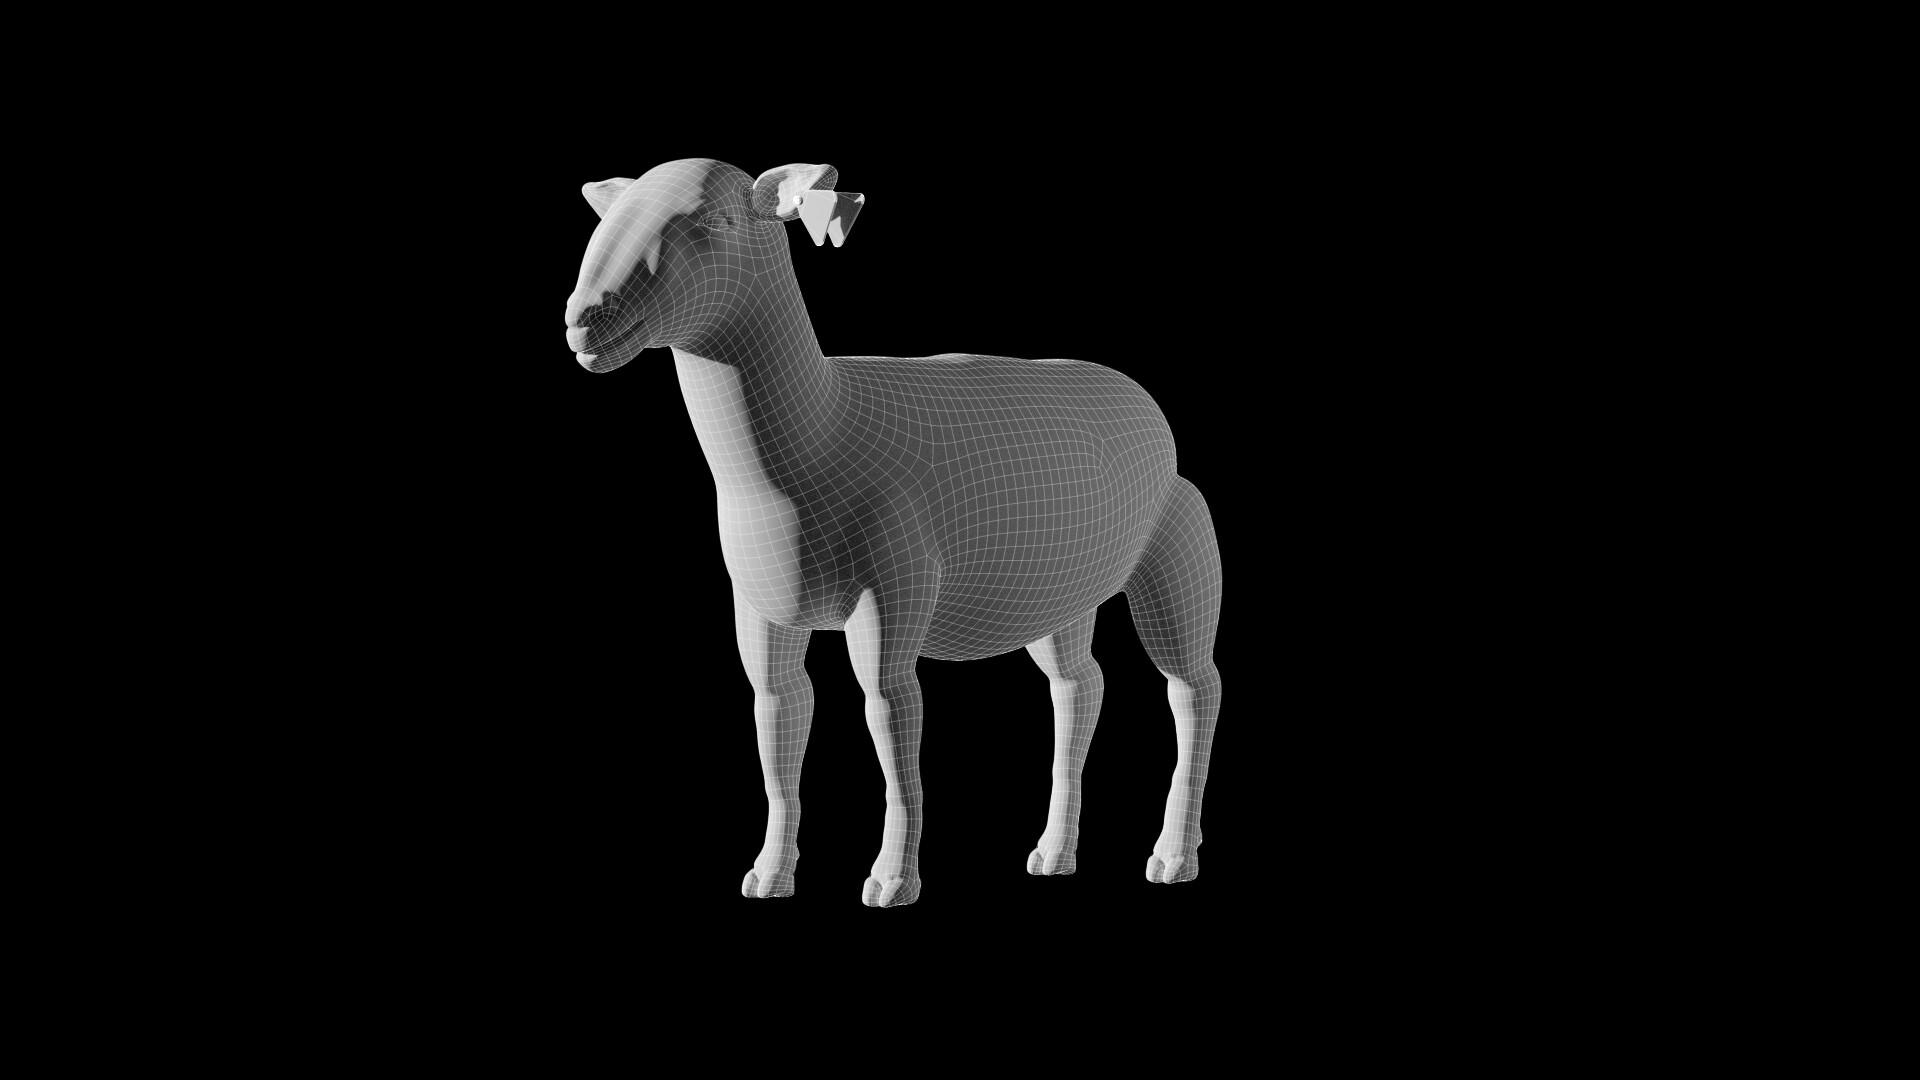 Michelangelo girardi sheepwf